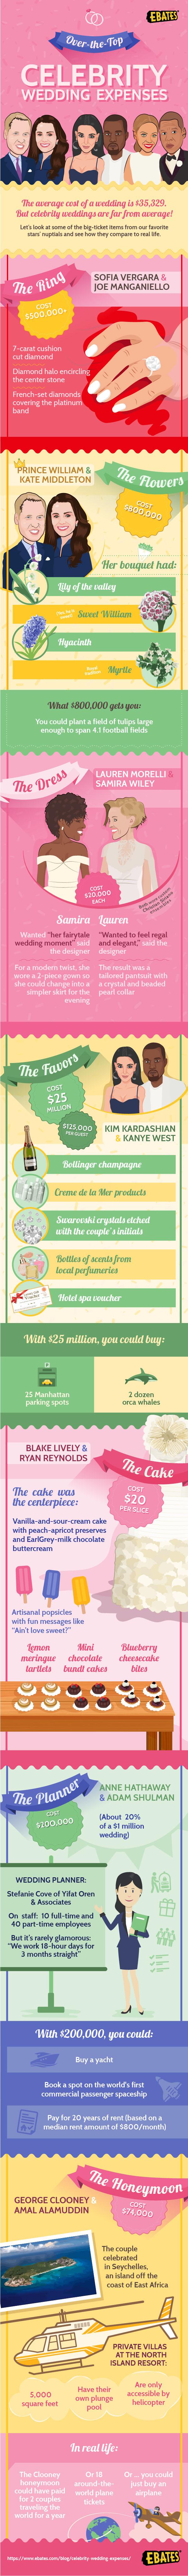 over the top celebrity wedding expenses ebates blog